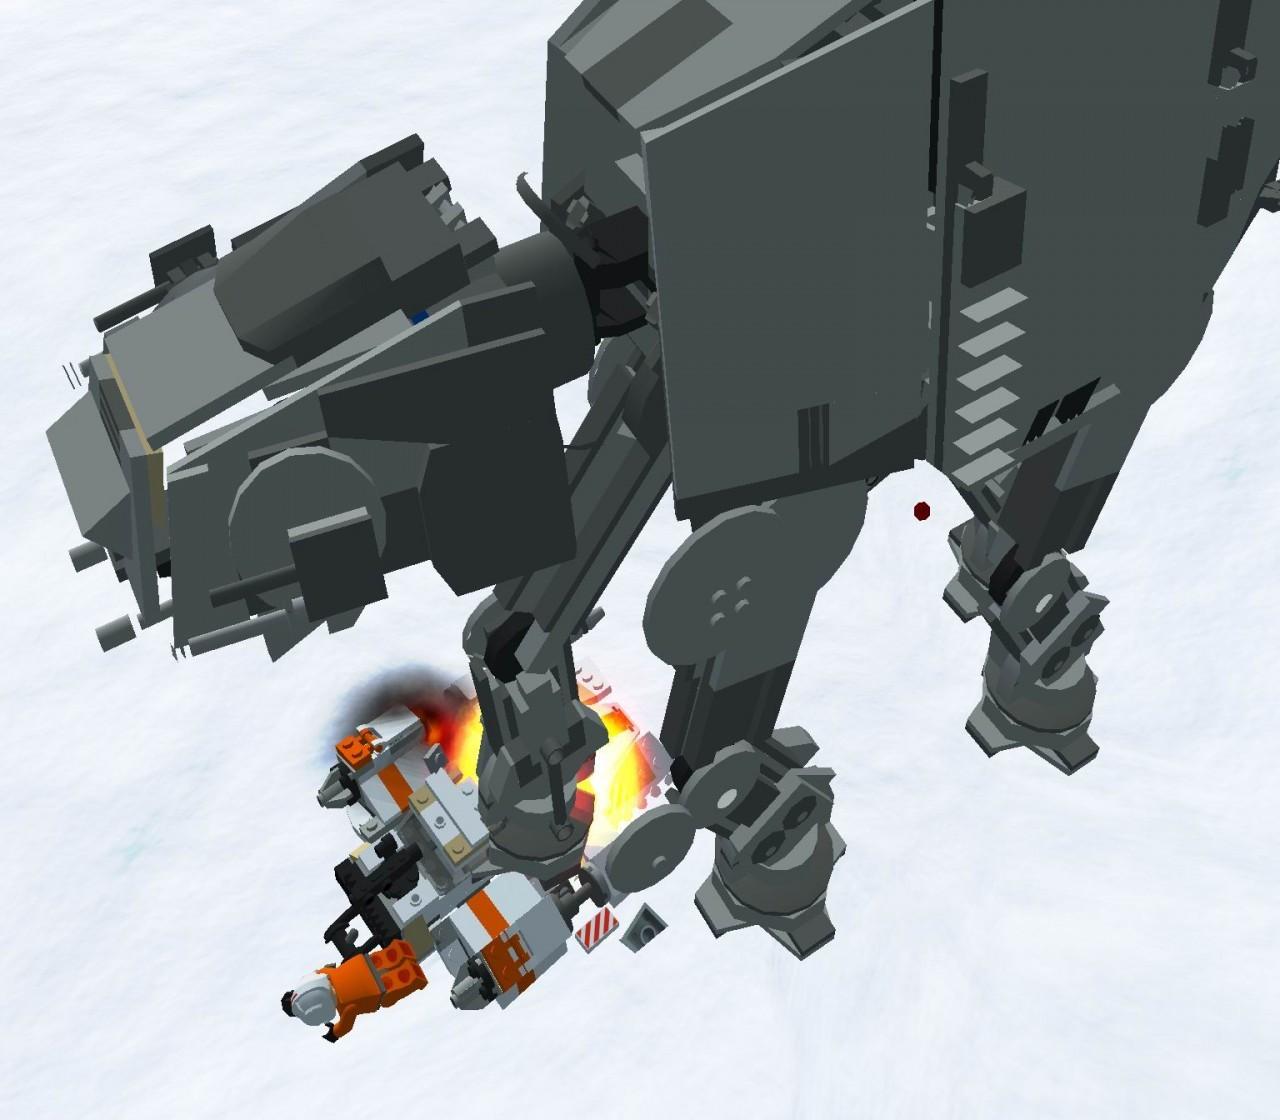 Nouvelles images de LEGO Star Wars II